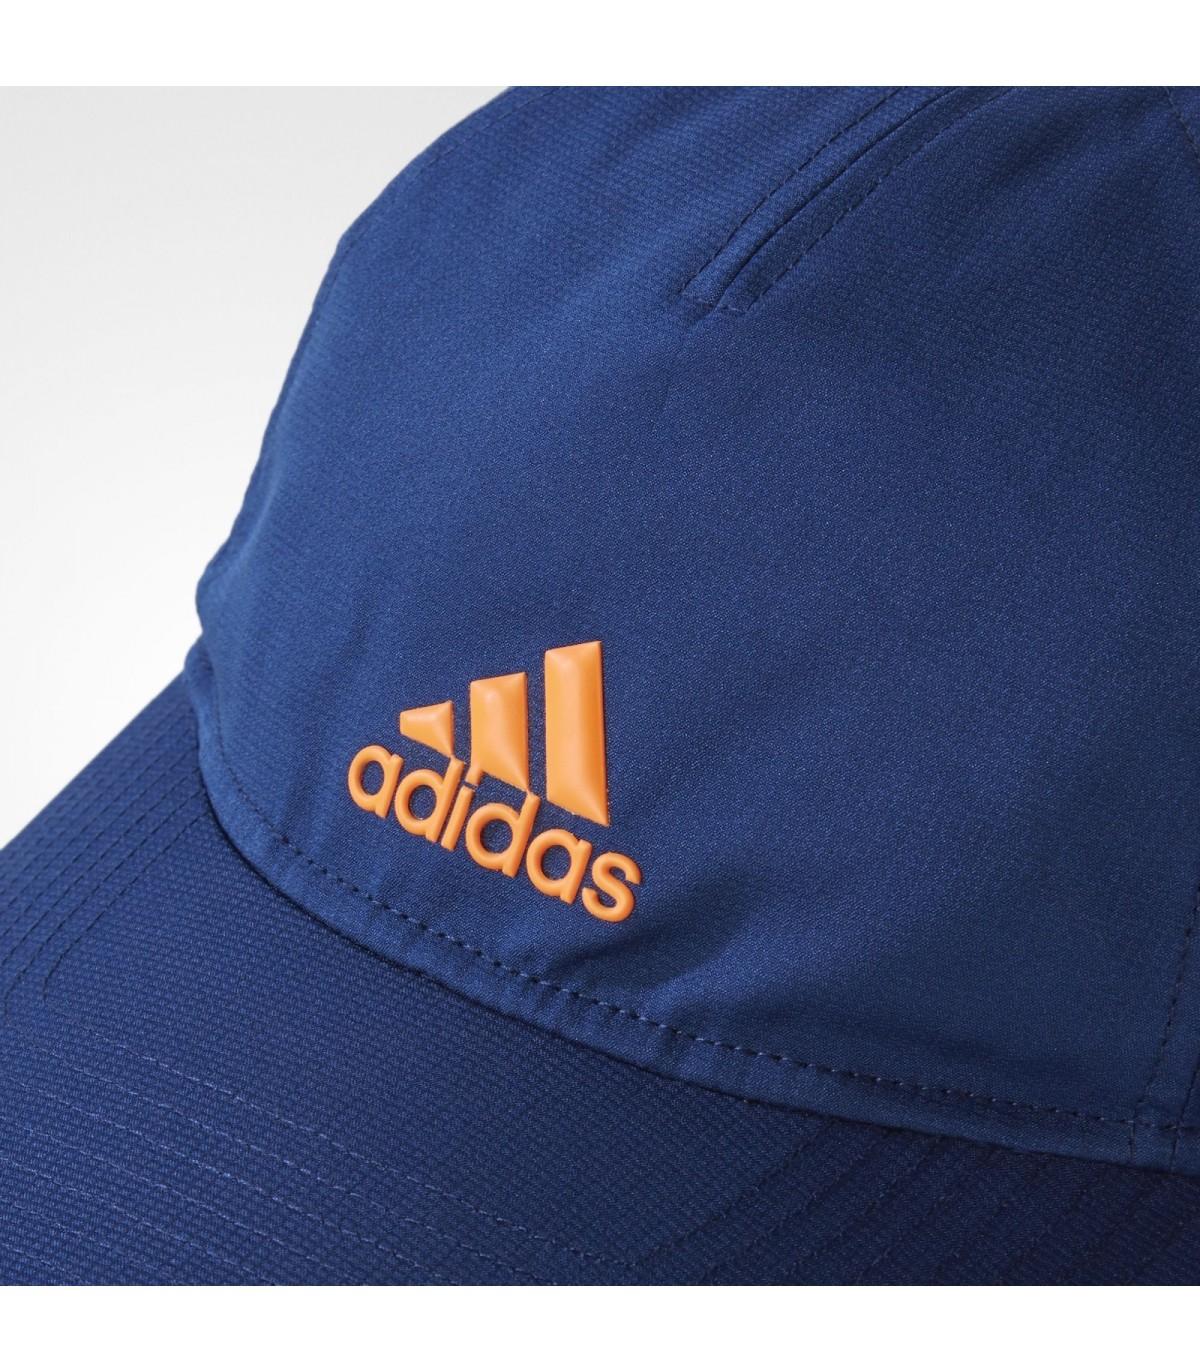 4413e2f935e3 Casquette de squash Adidas Climacool - Mystery Blue   Glow Orange ...